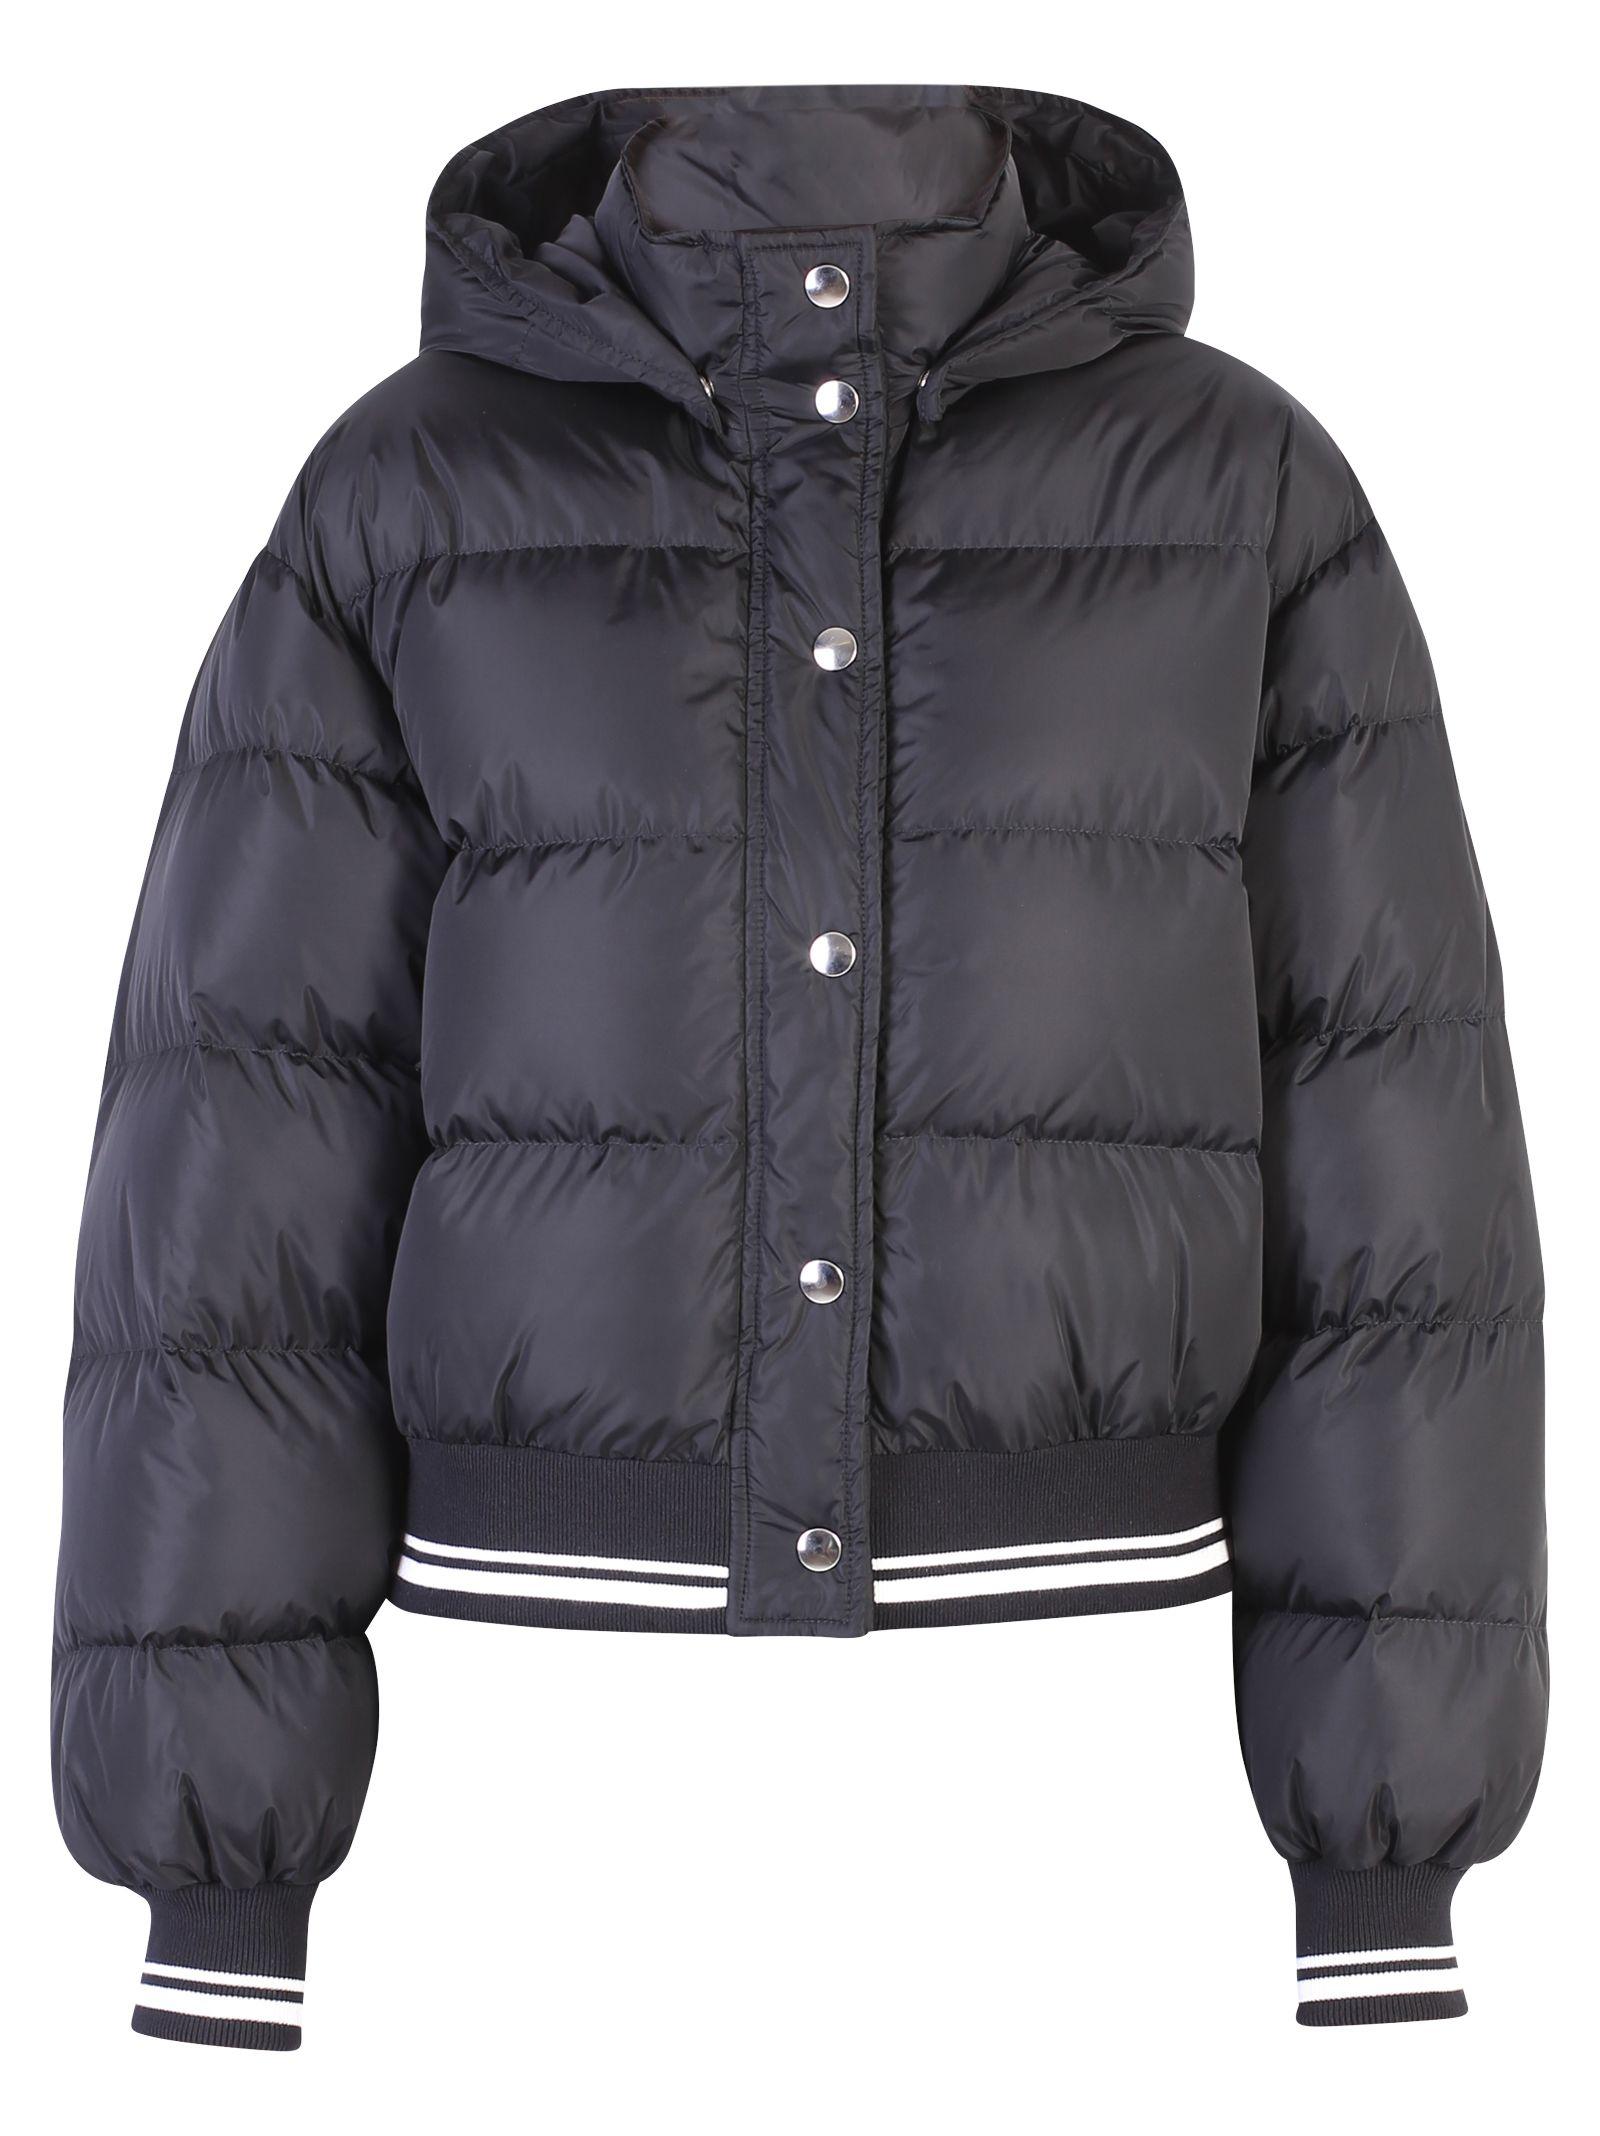 Black Branded Padded Jacket